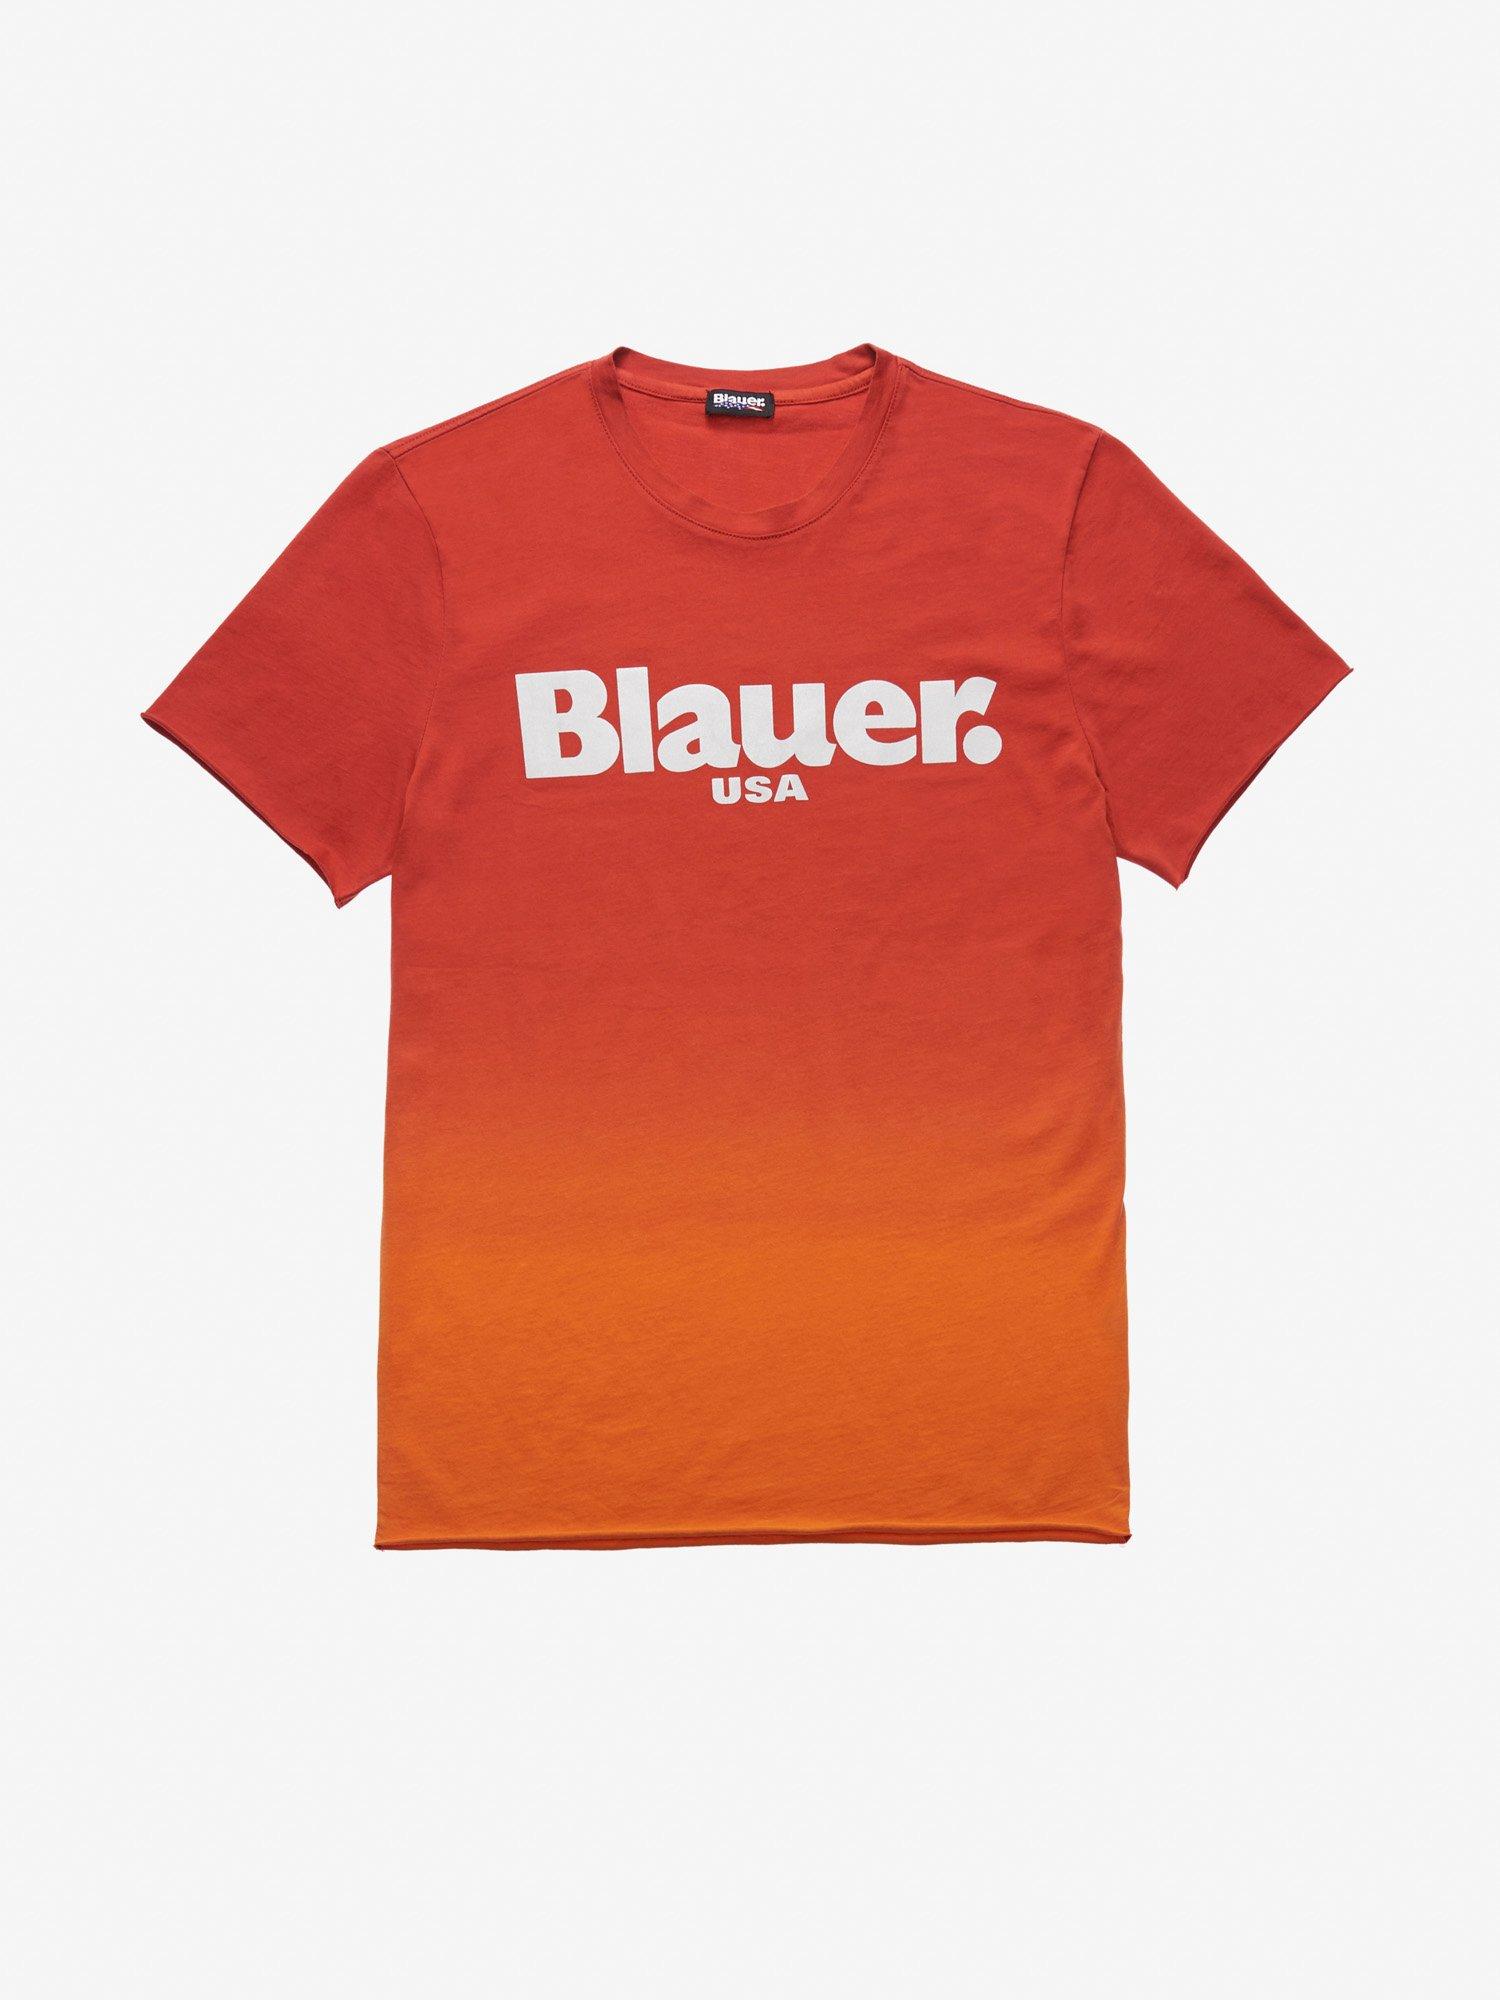 Blauer - SHADED T-SHIRT - Red Ginger - Blauer